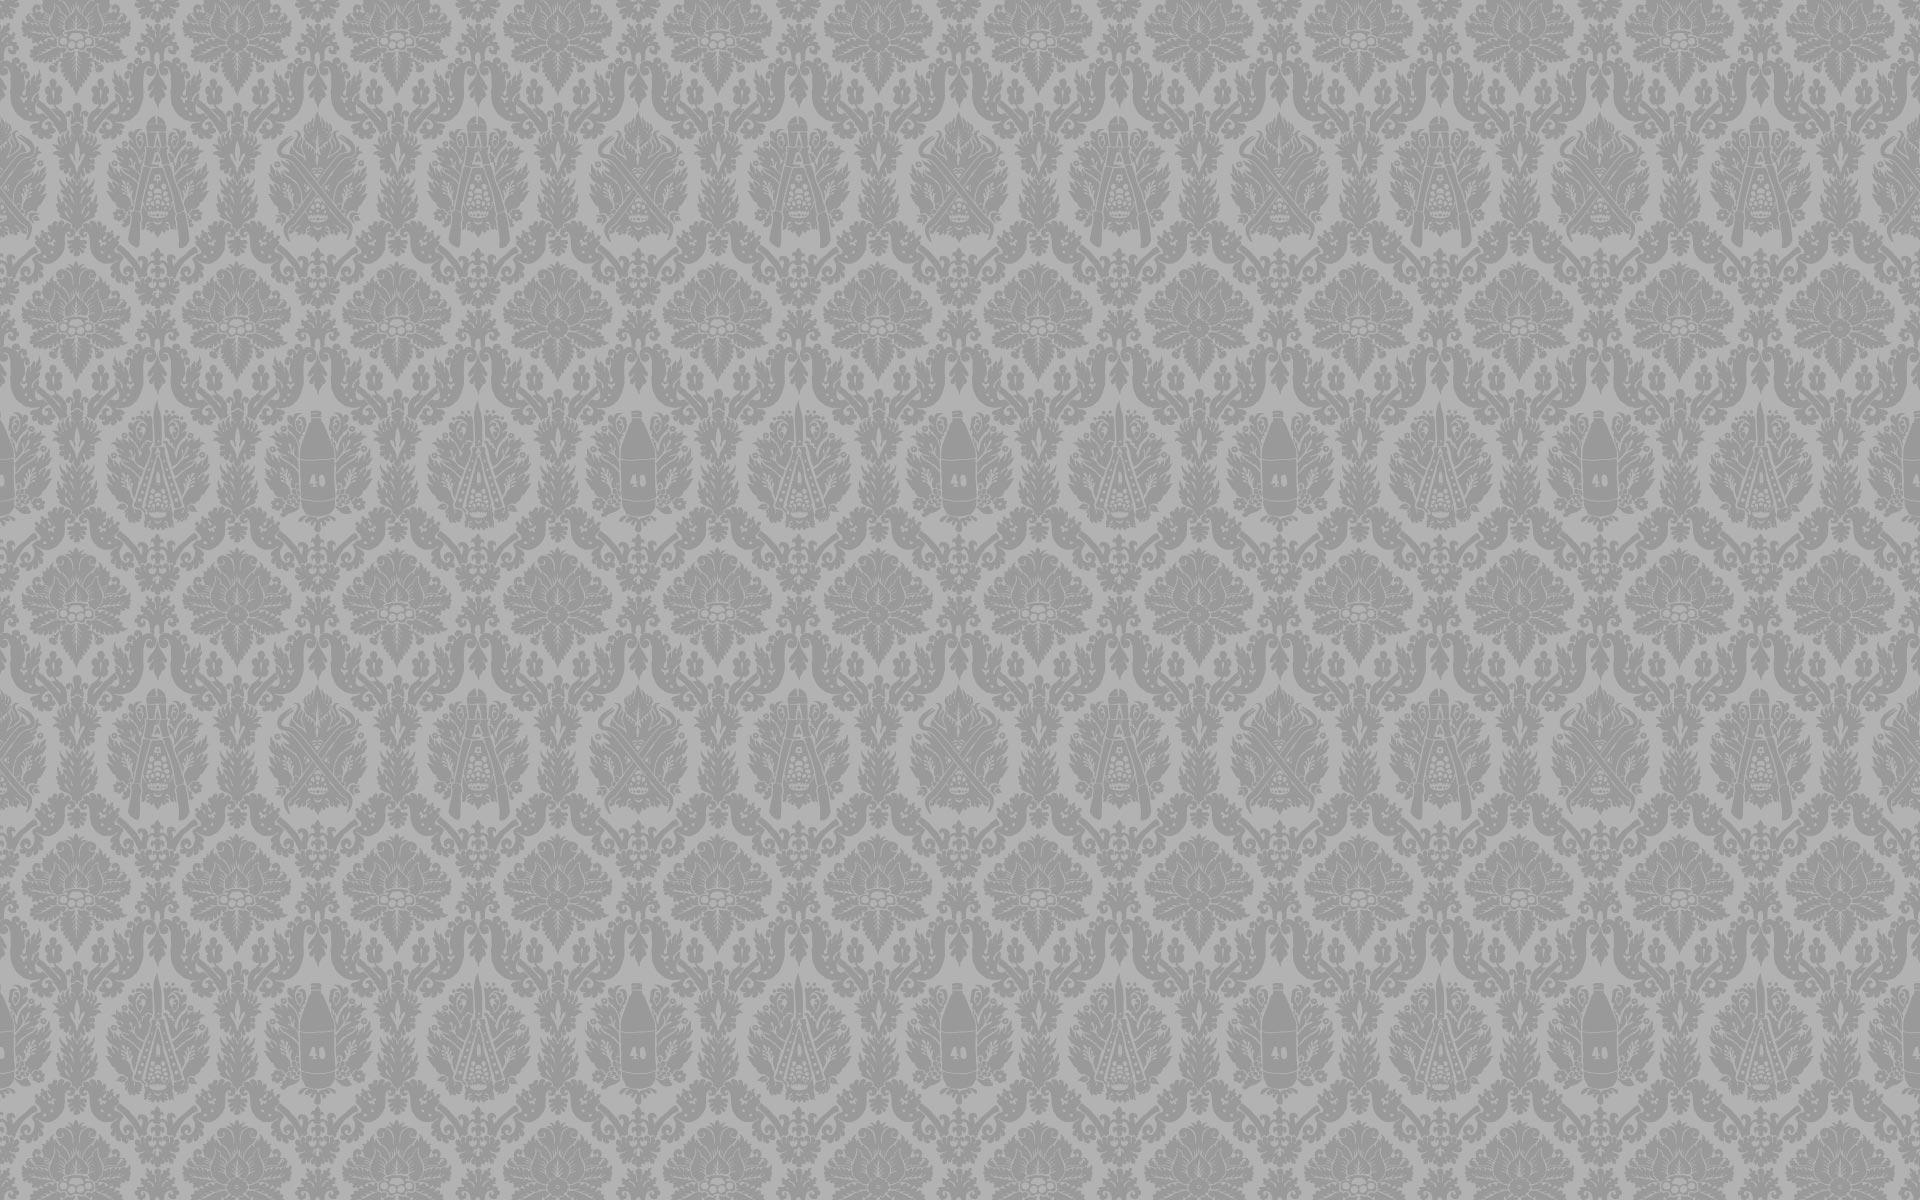 1920x1080 Old Wallpaper